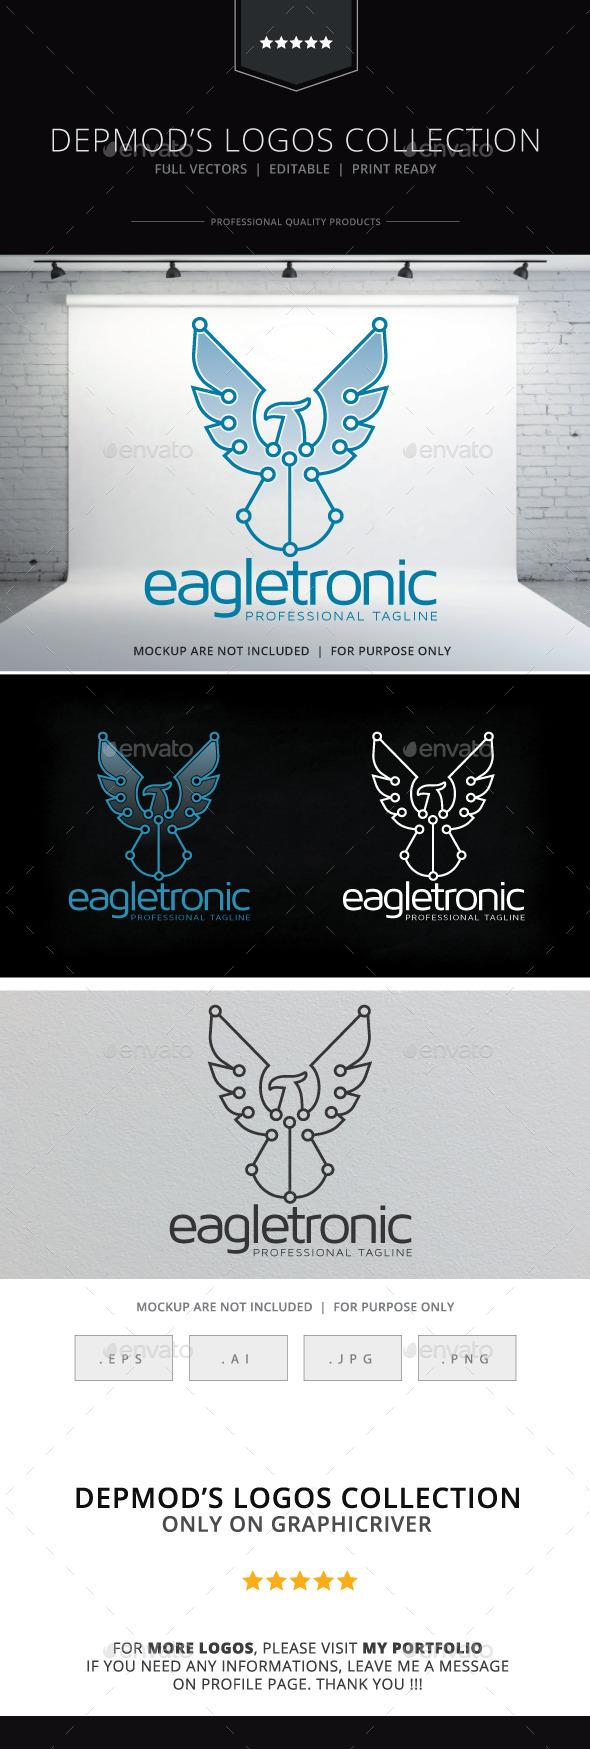 GraphicRiver Eagletronic Logo 10679434